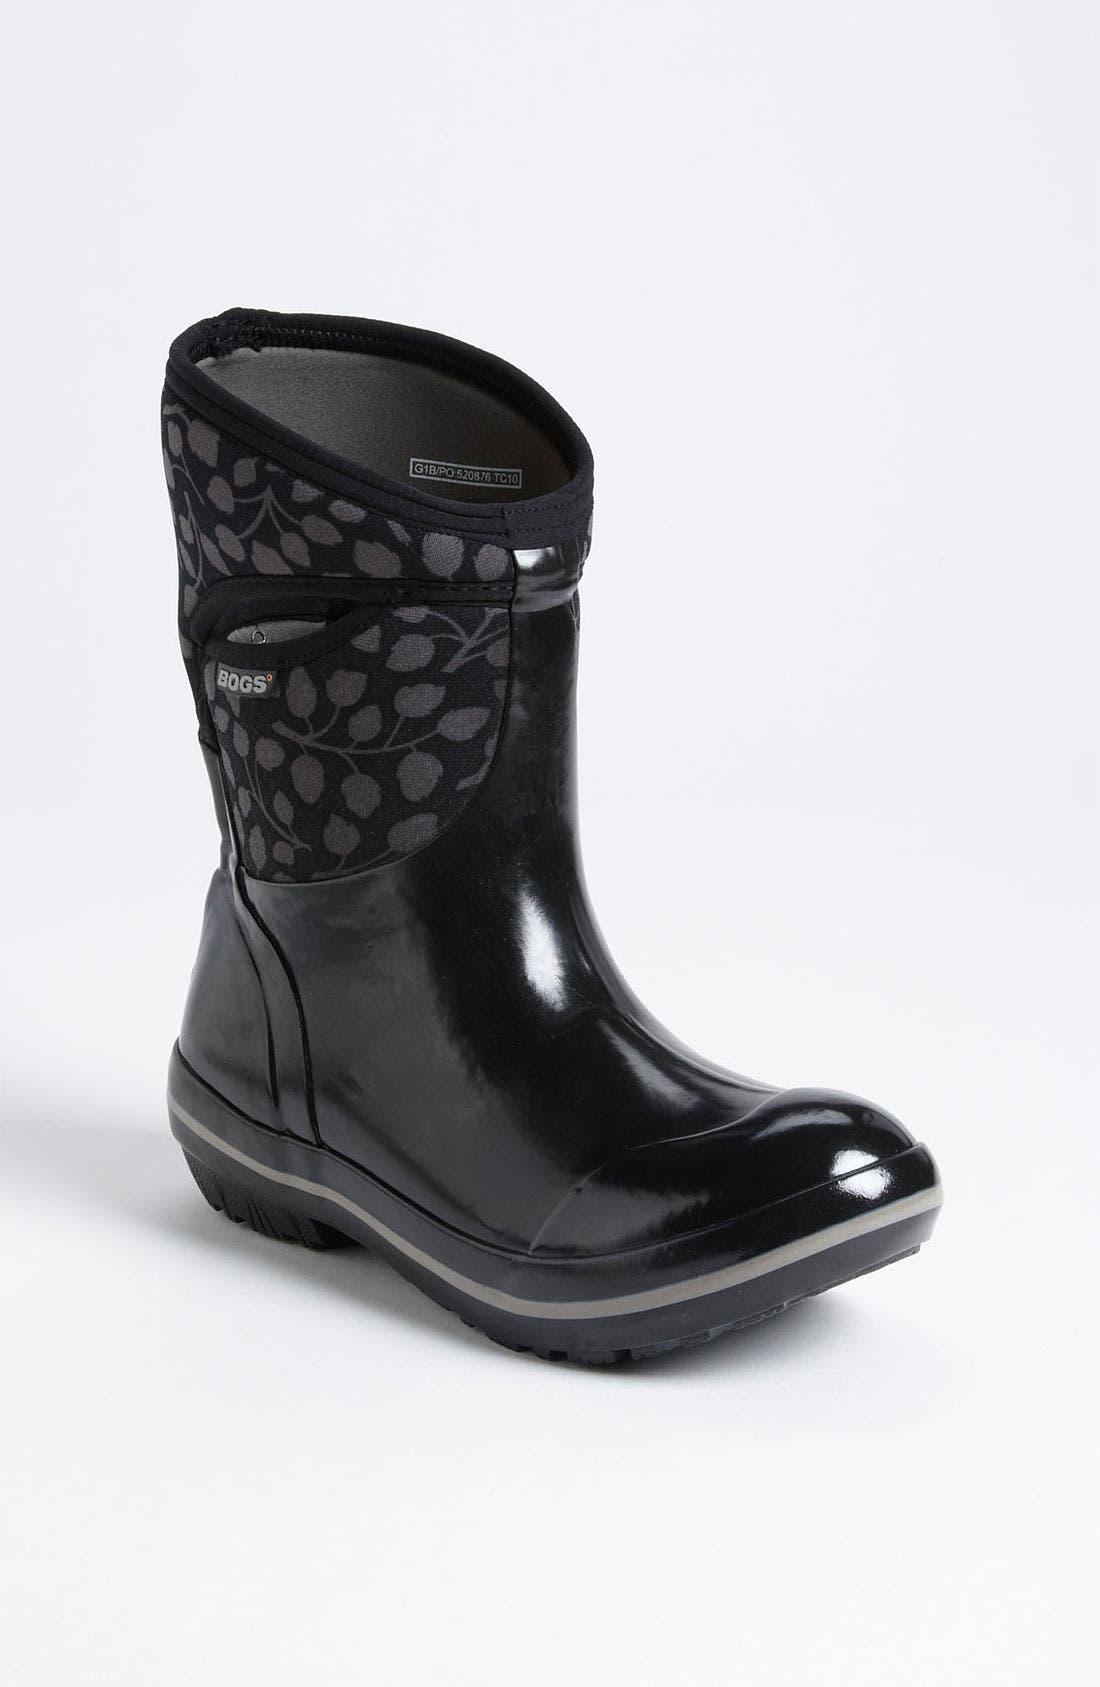 Main Image - Bogs 'Plimsoll Mid Leaf' Rain Boot (Women)